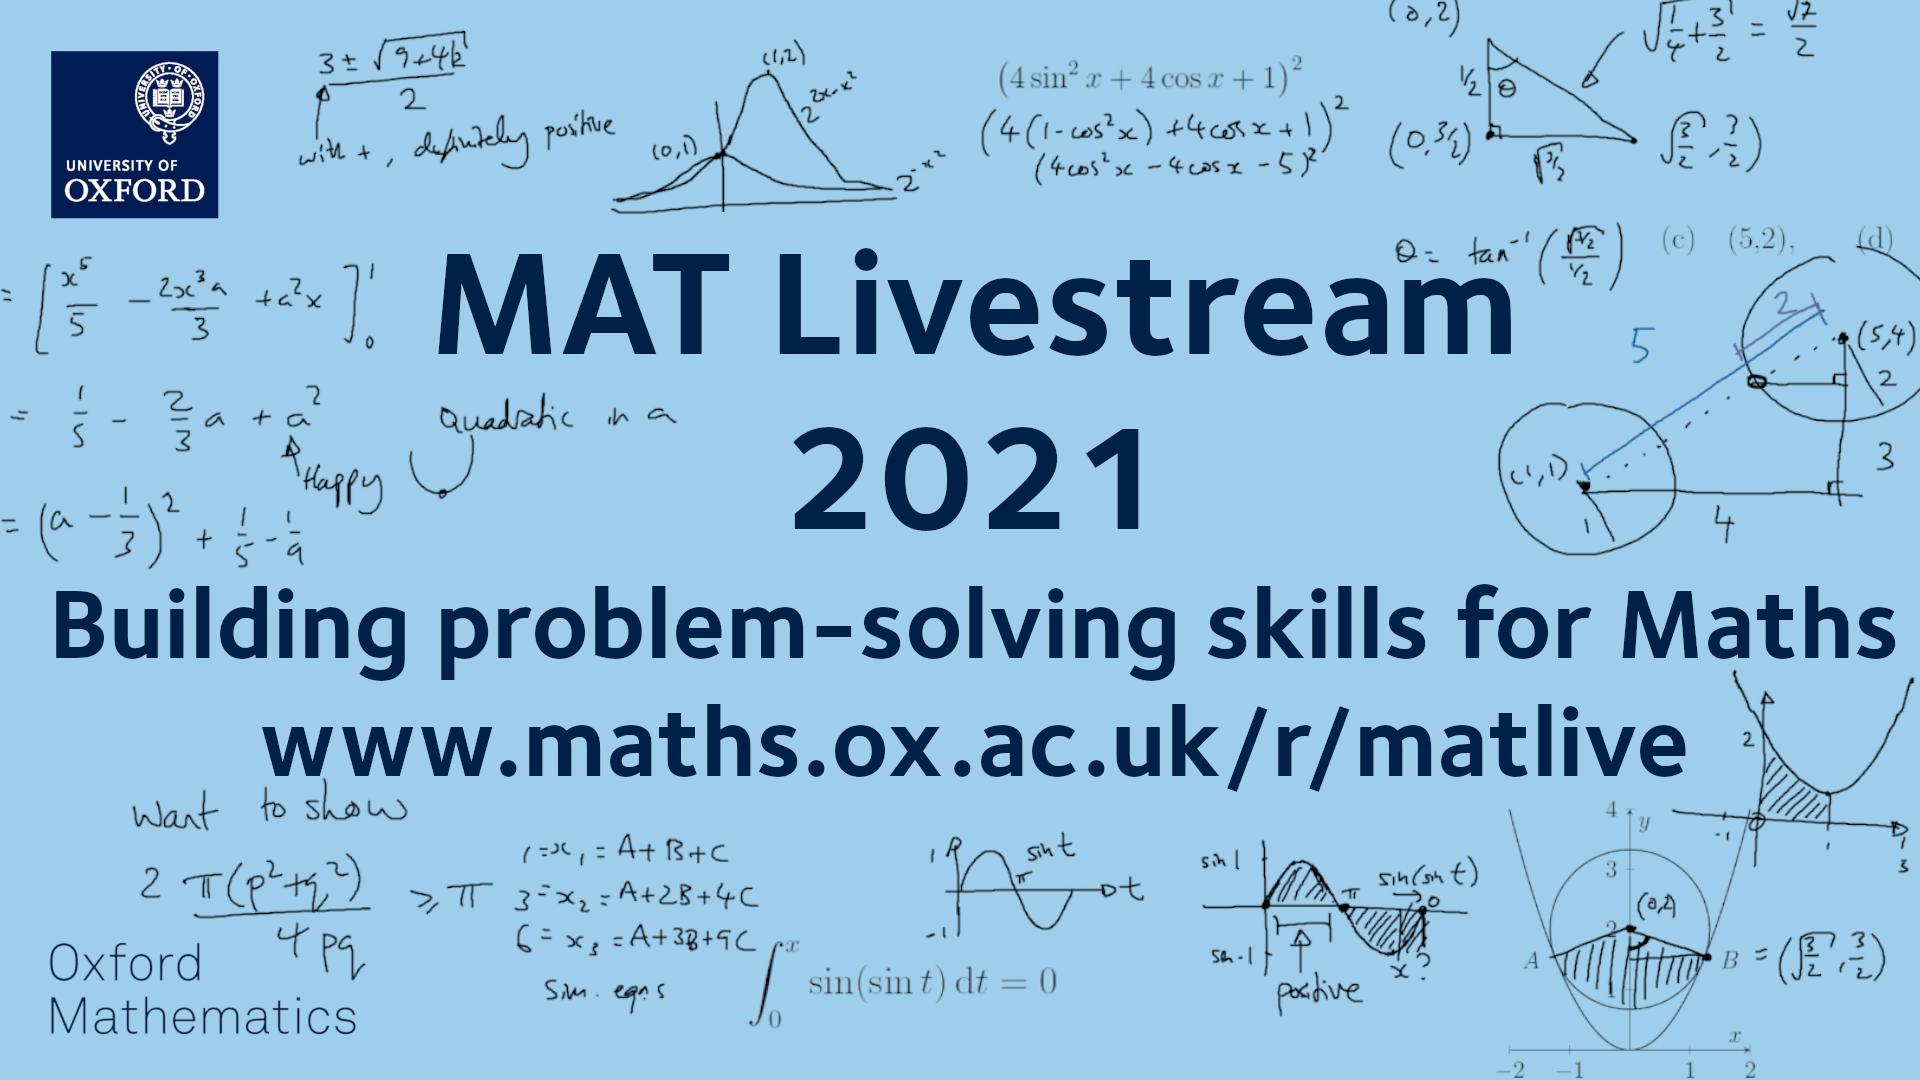 MAT Livestream 2021. Building problem-solving skills for Maths. www.maths.ox.ac.uk/r/matlive